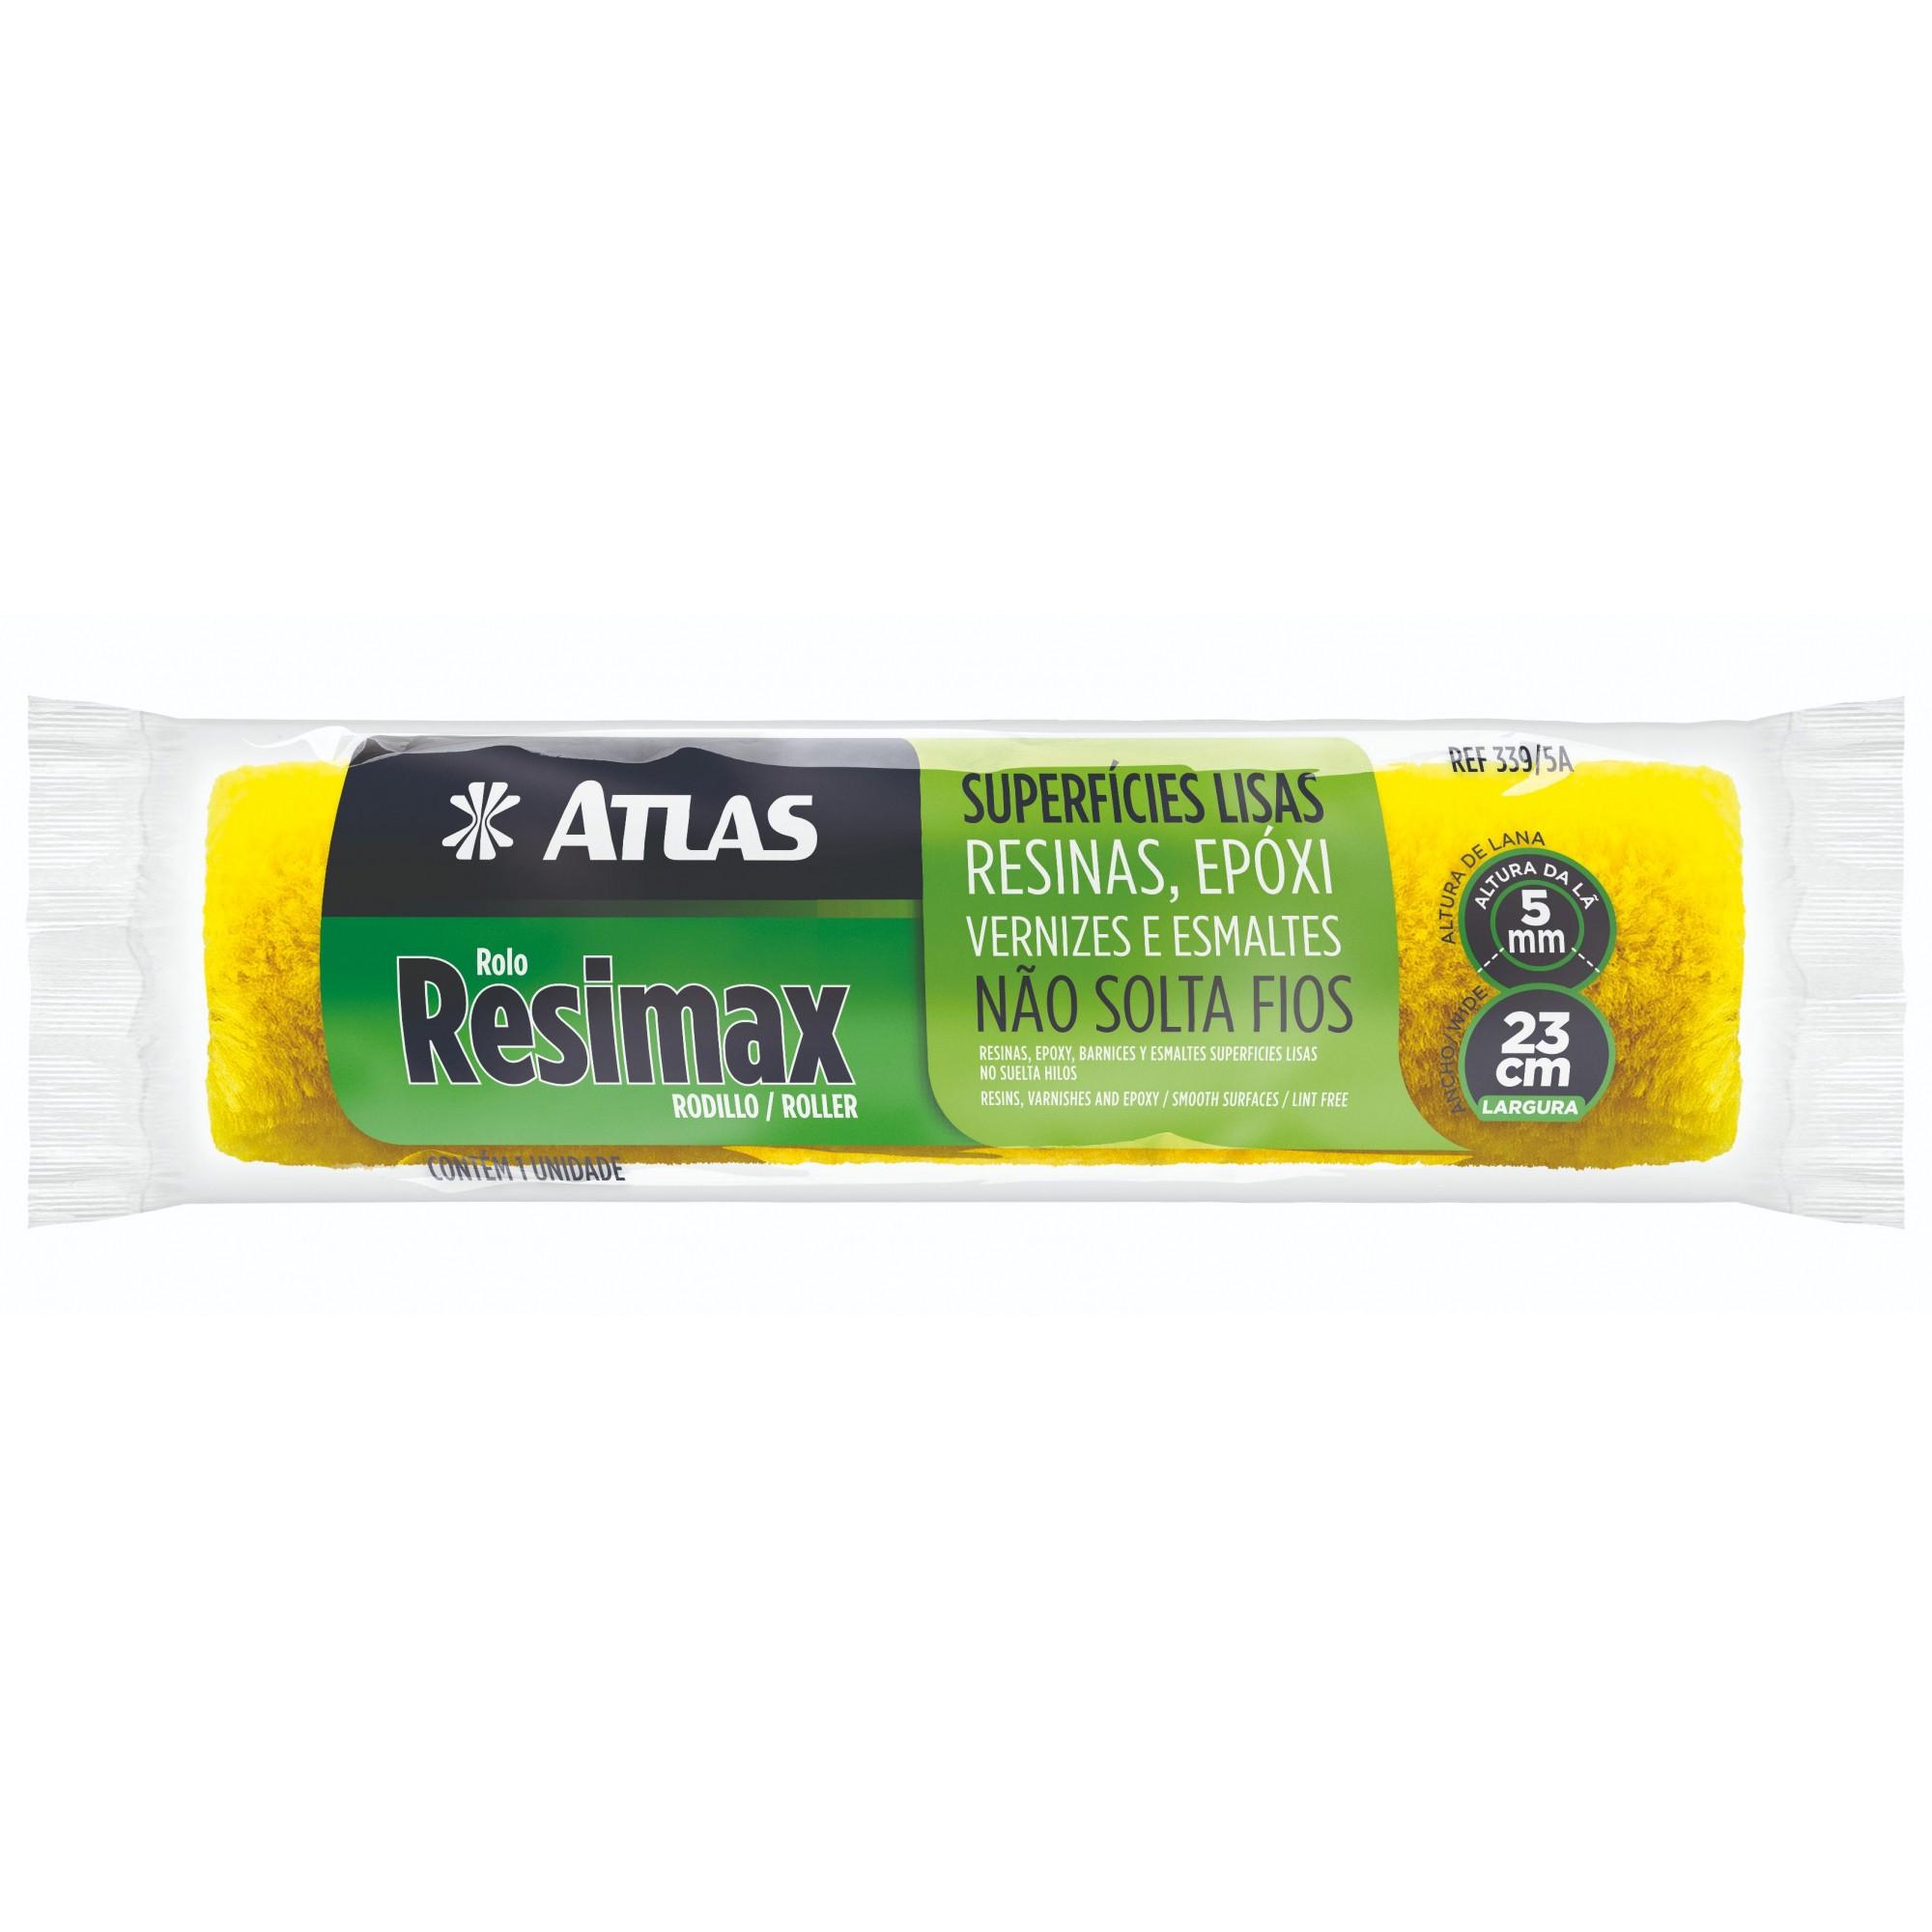 Rolo Resimax 23 Cm Atlas 339/5A.